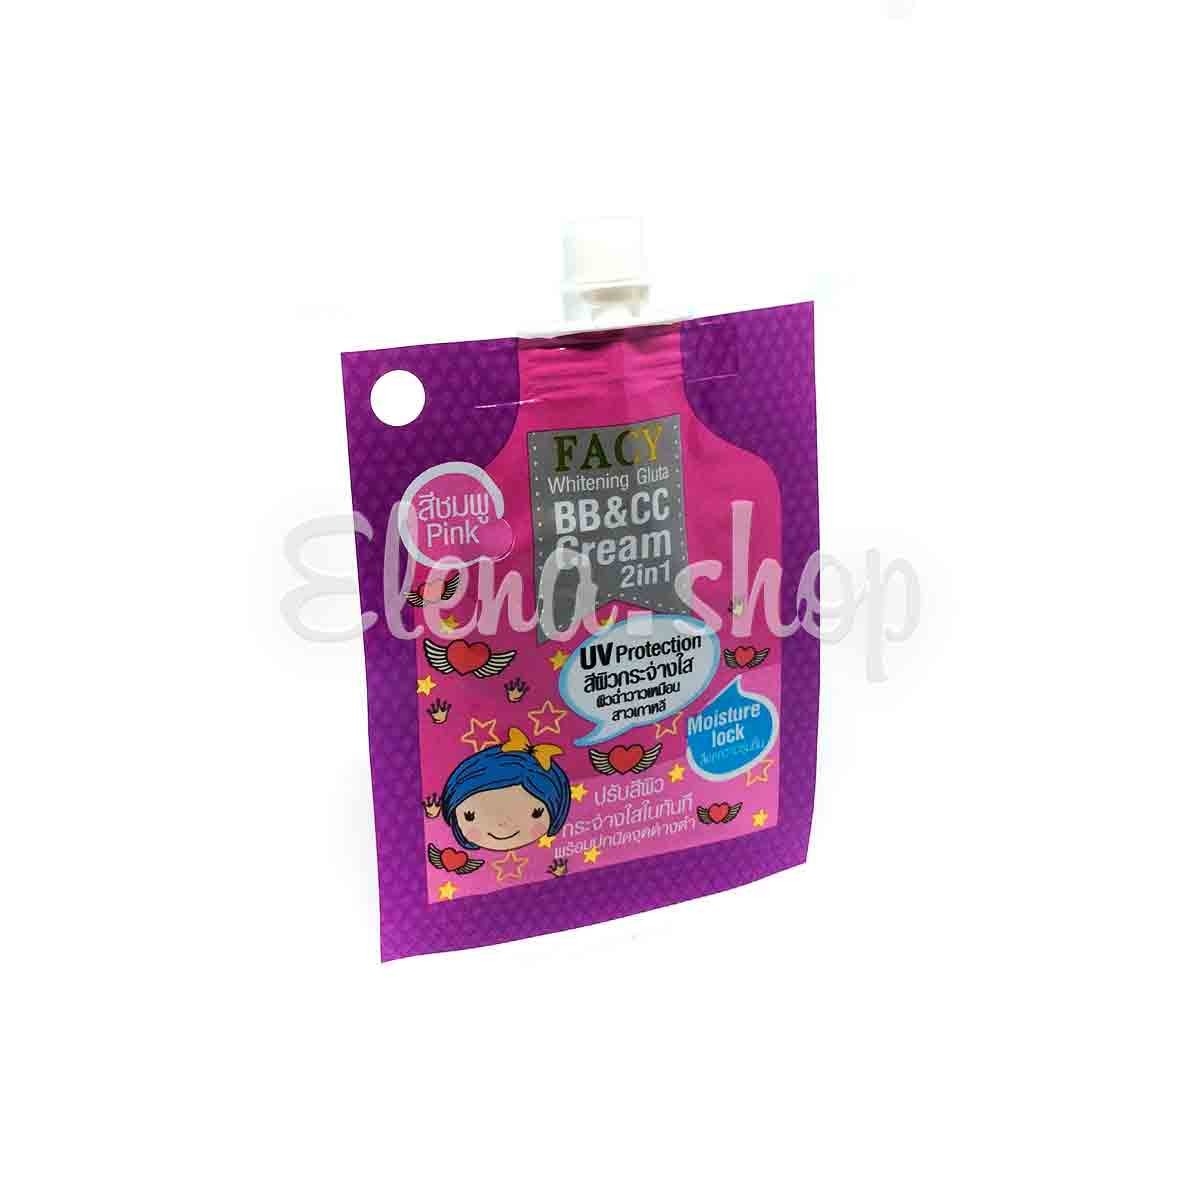 Крем для лица Facy Whitening Gluta BB & CC cream (розовый)